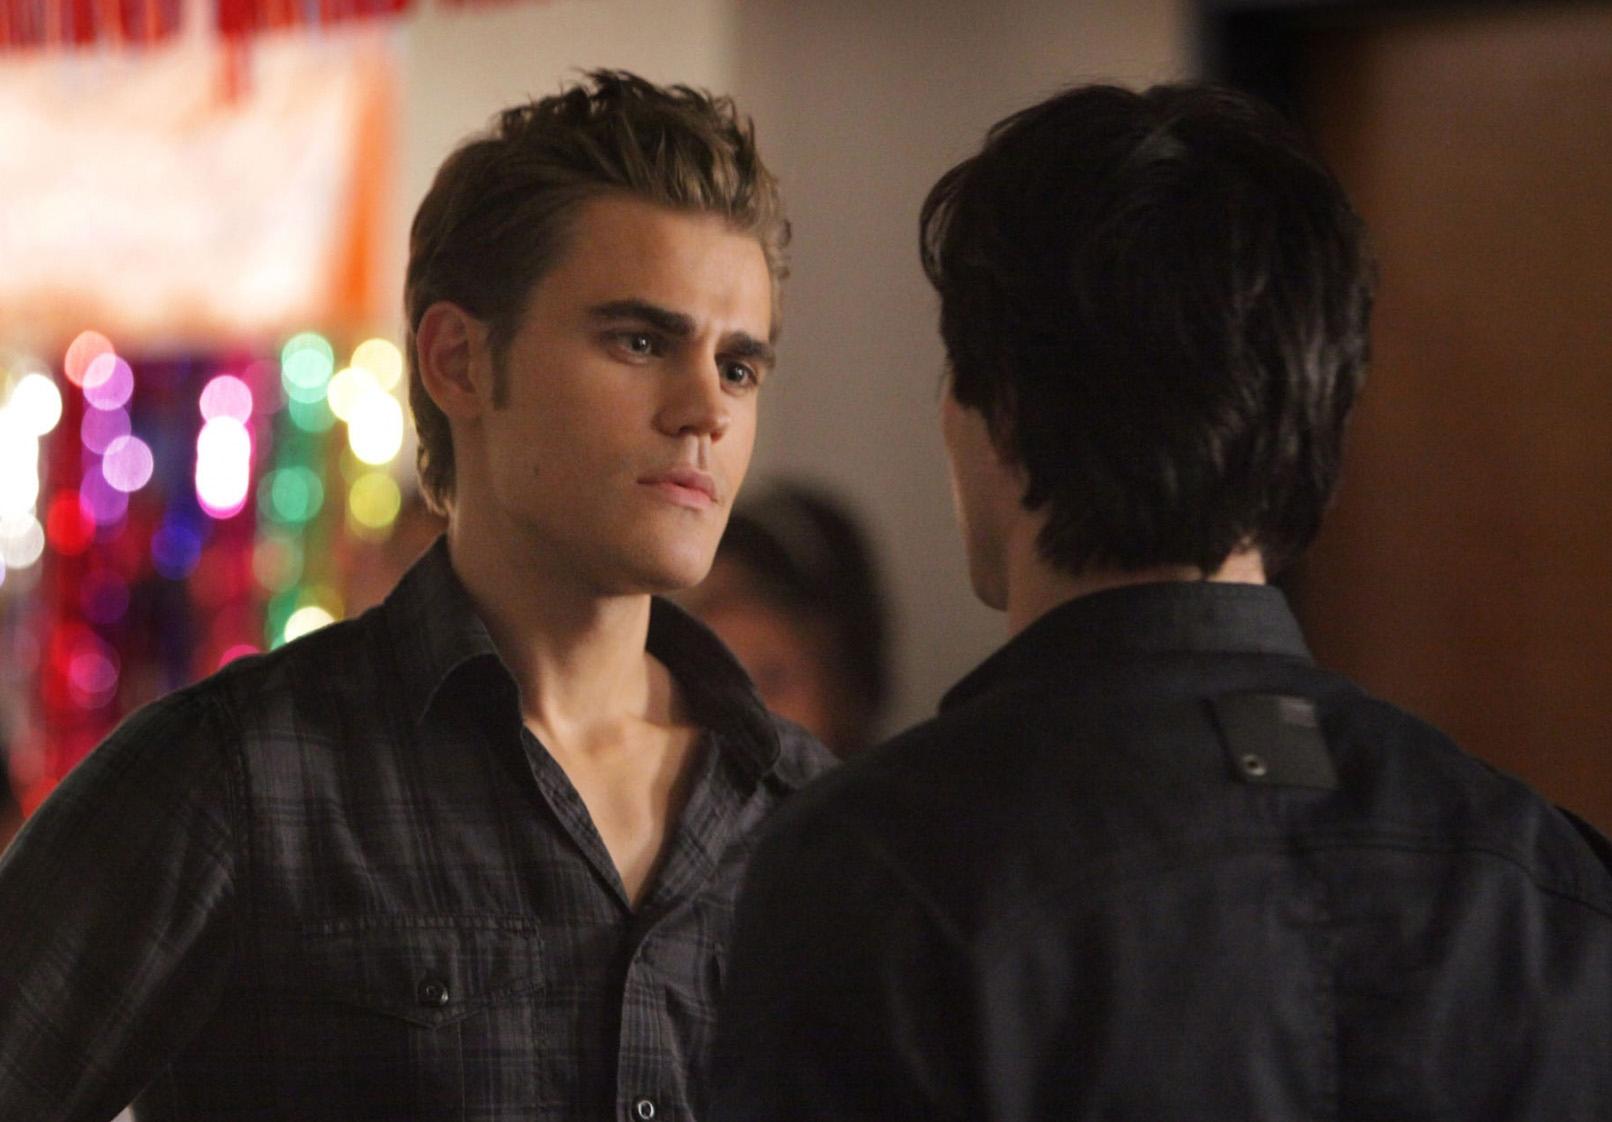 File:Vampire-diaries-season-2-brave-new-world-promo-pics-13.jpg